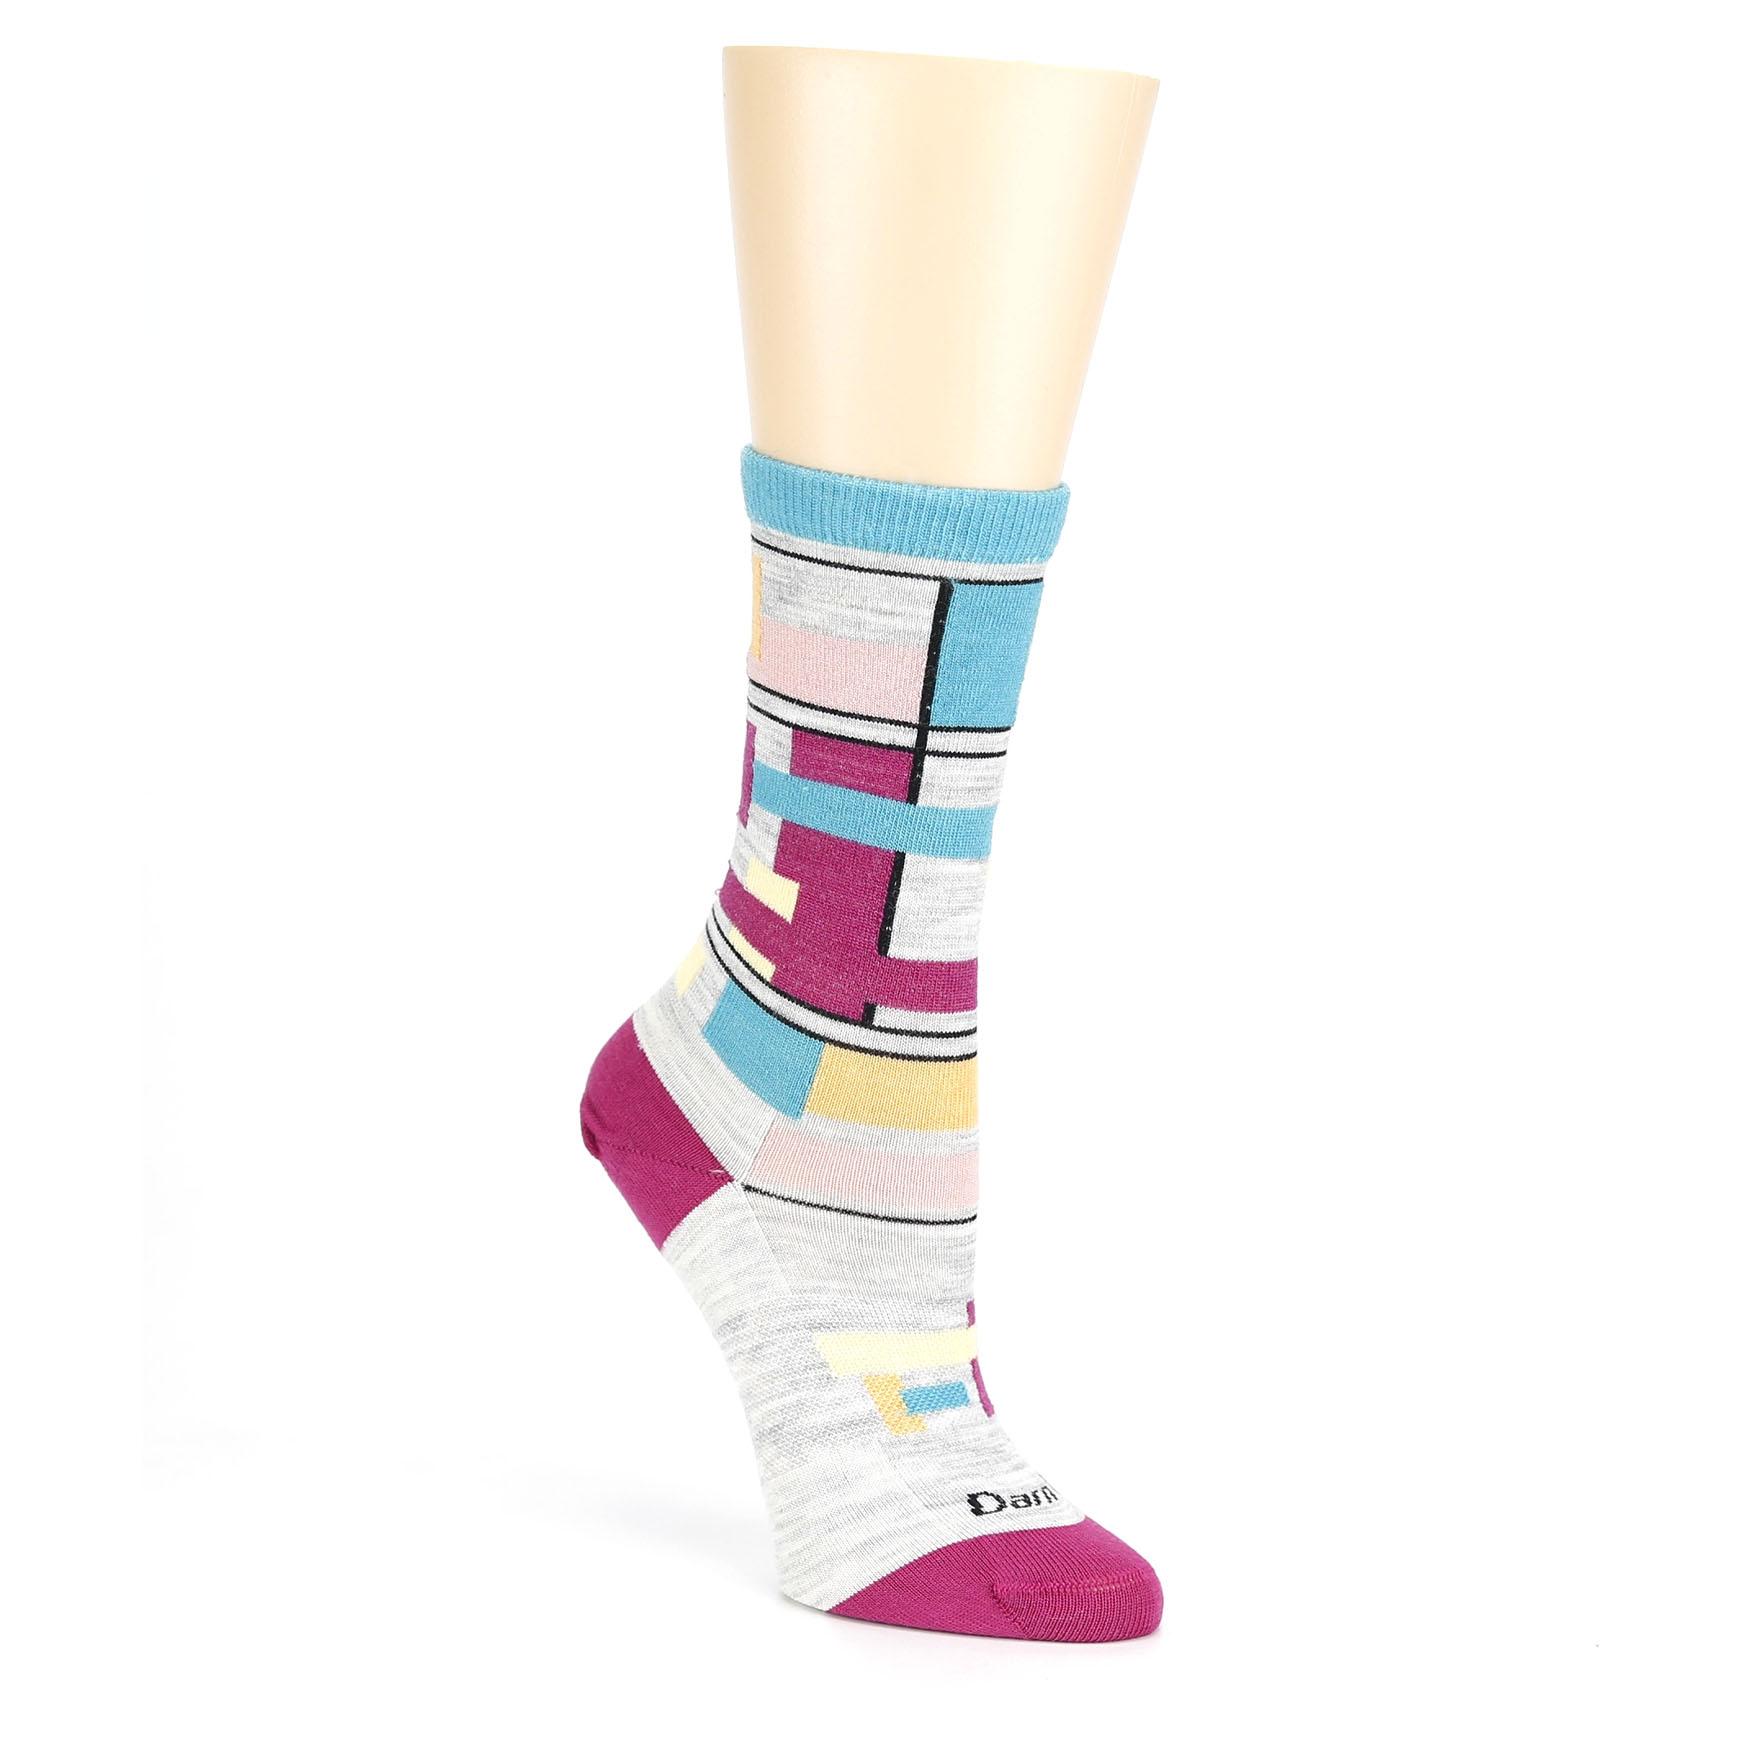 Darn Tough Alexa Crew Light Socks Womens